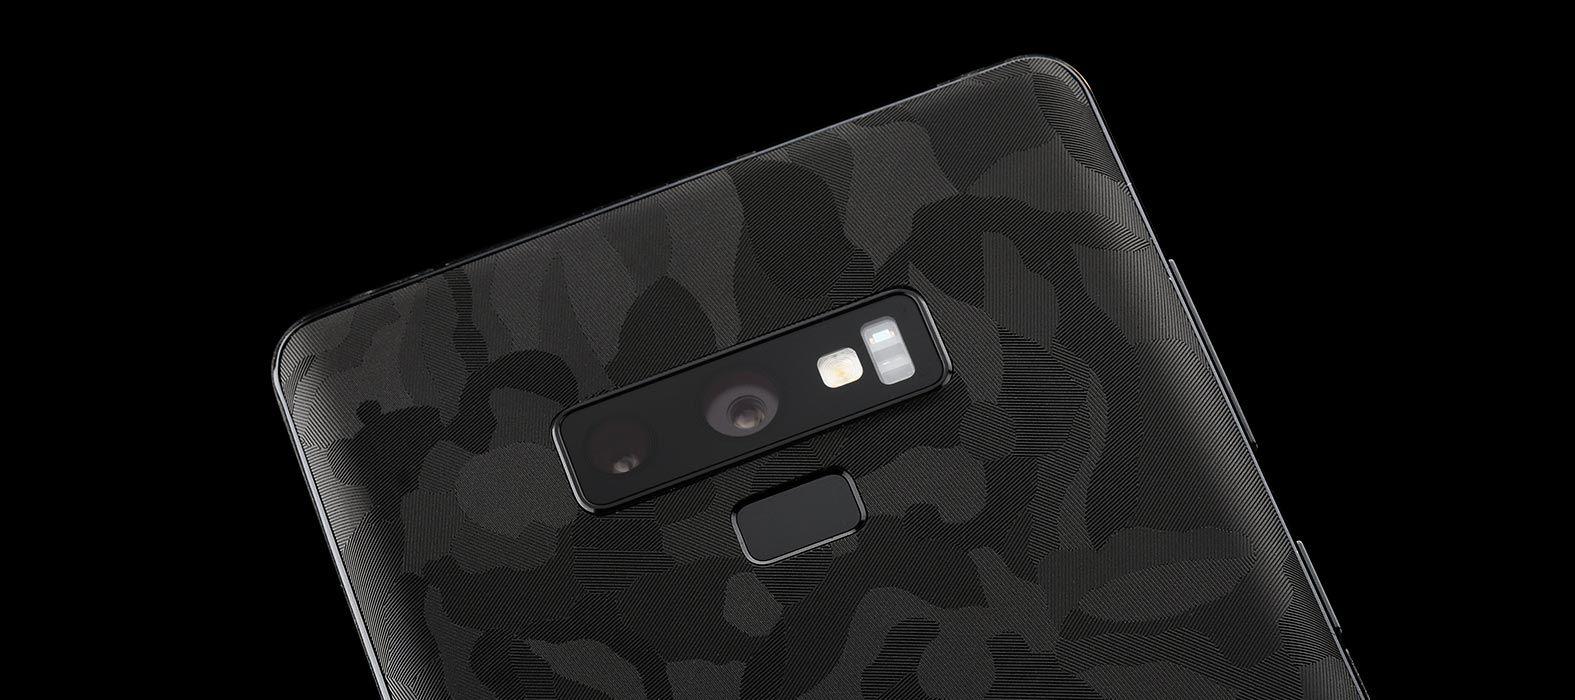 Galaxy Note 9 Black Camo Skins